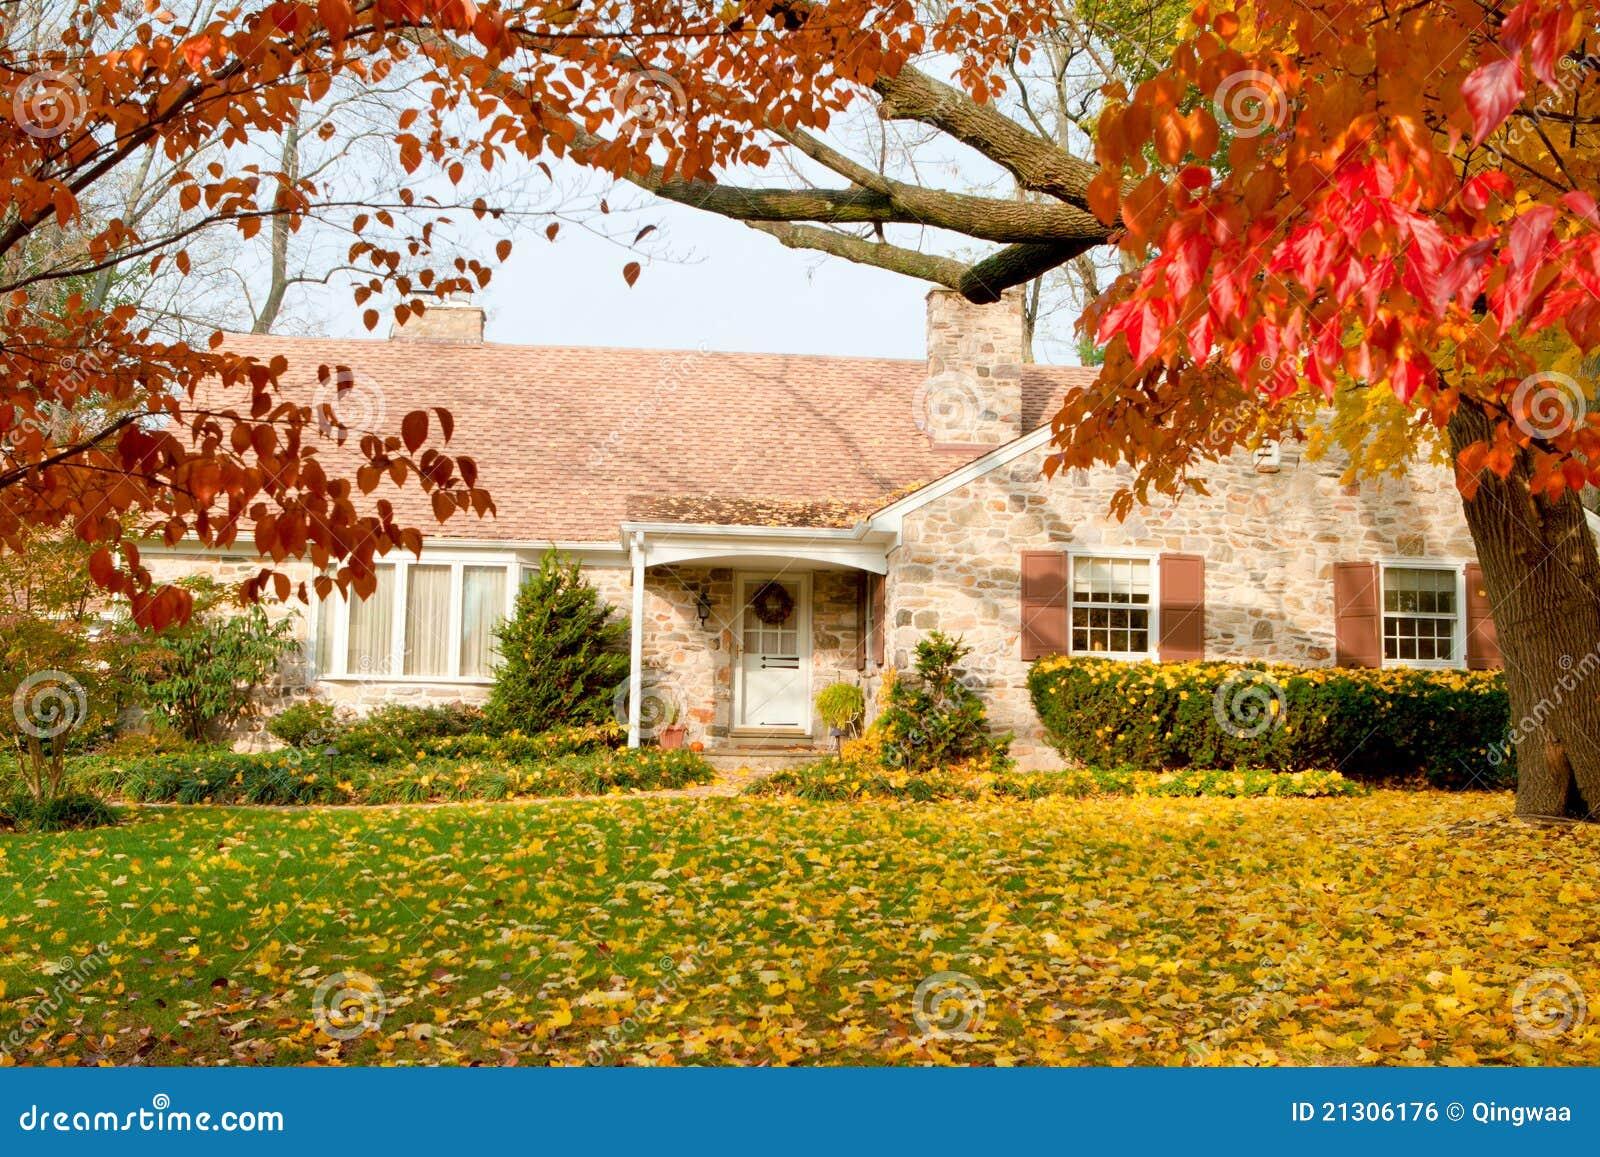 House Philadelphia Yellow Fall Autumn Leaves Tree Royalty Free Stock Image